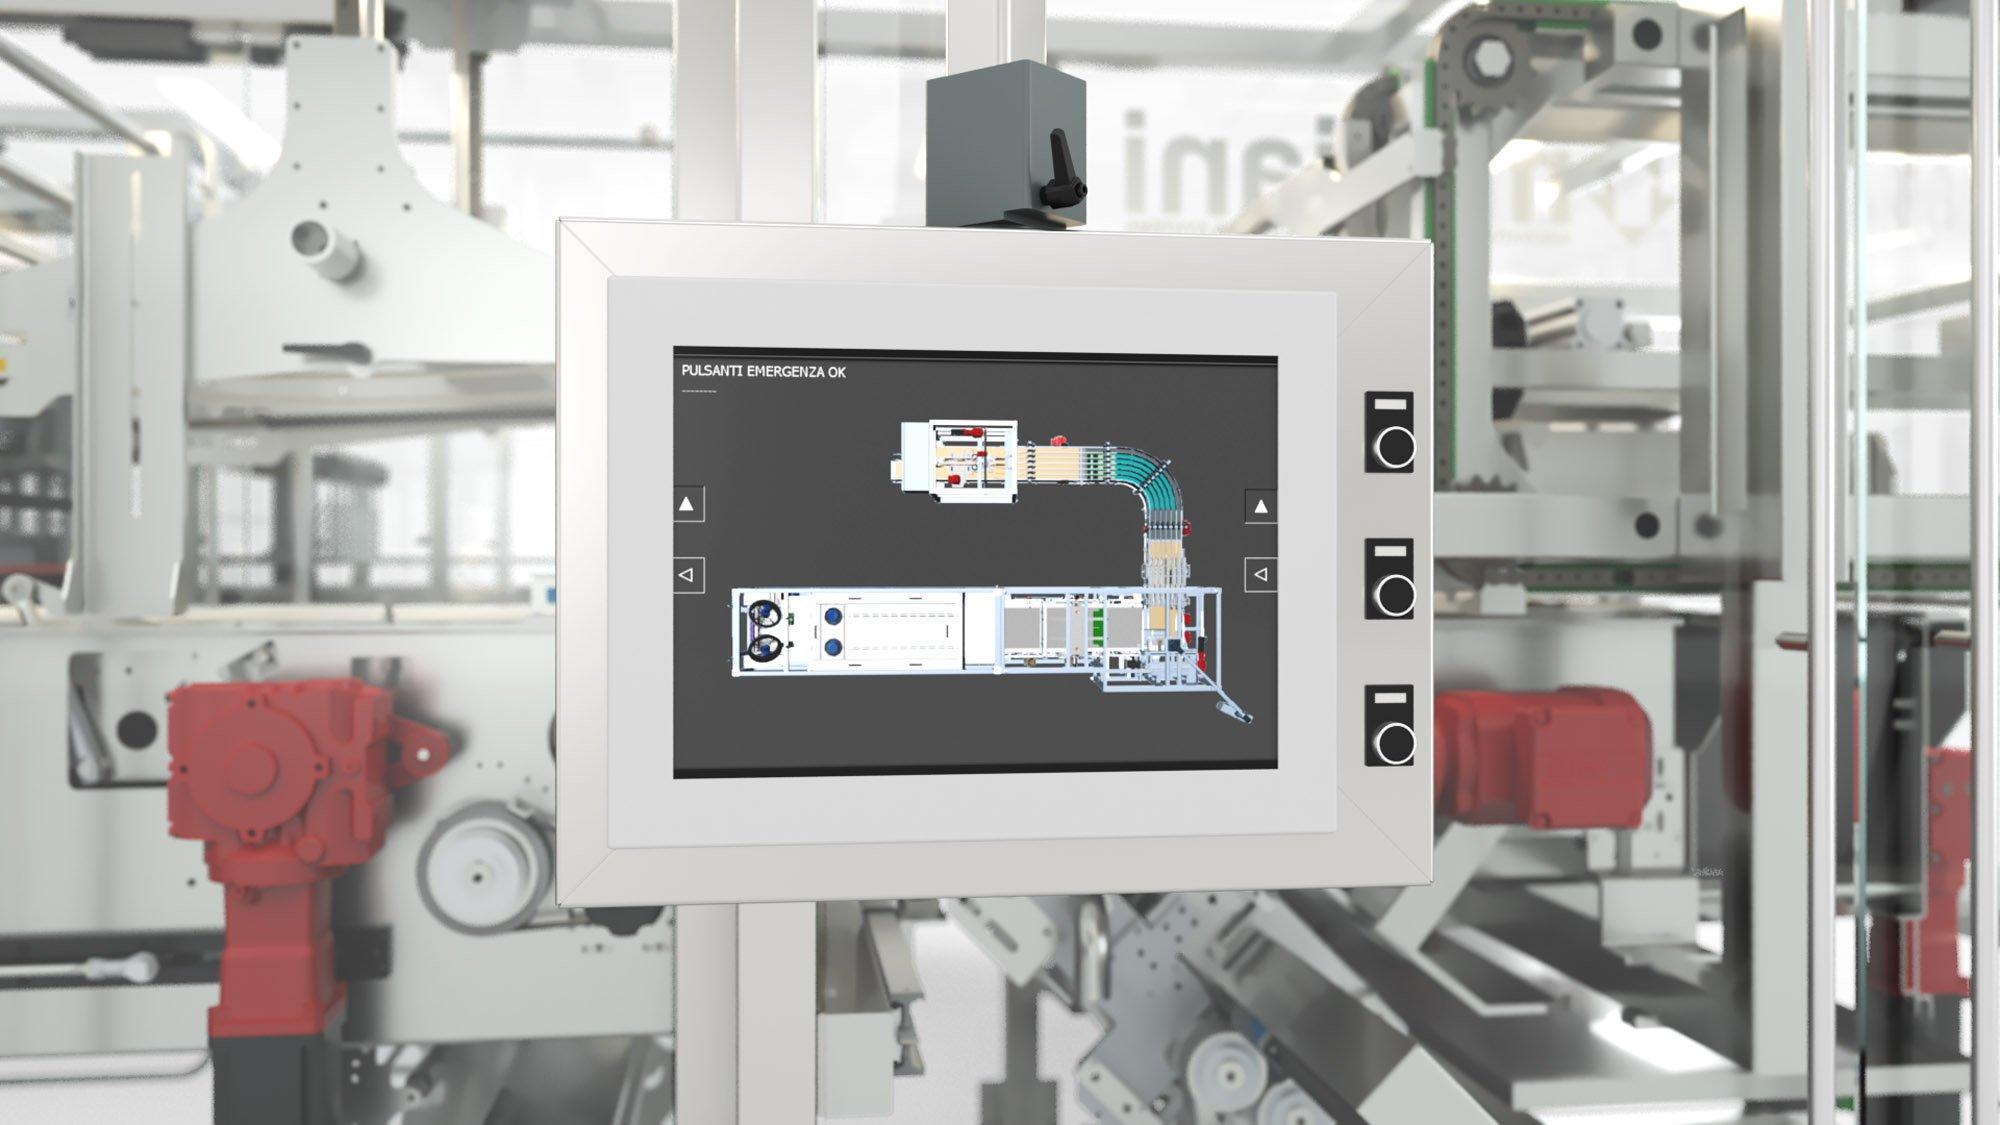 TRM-700 LF monitor - Mariani Srl